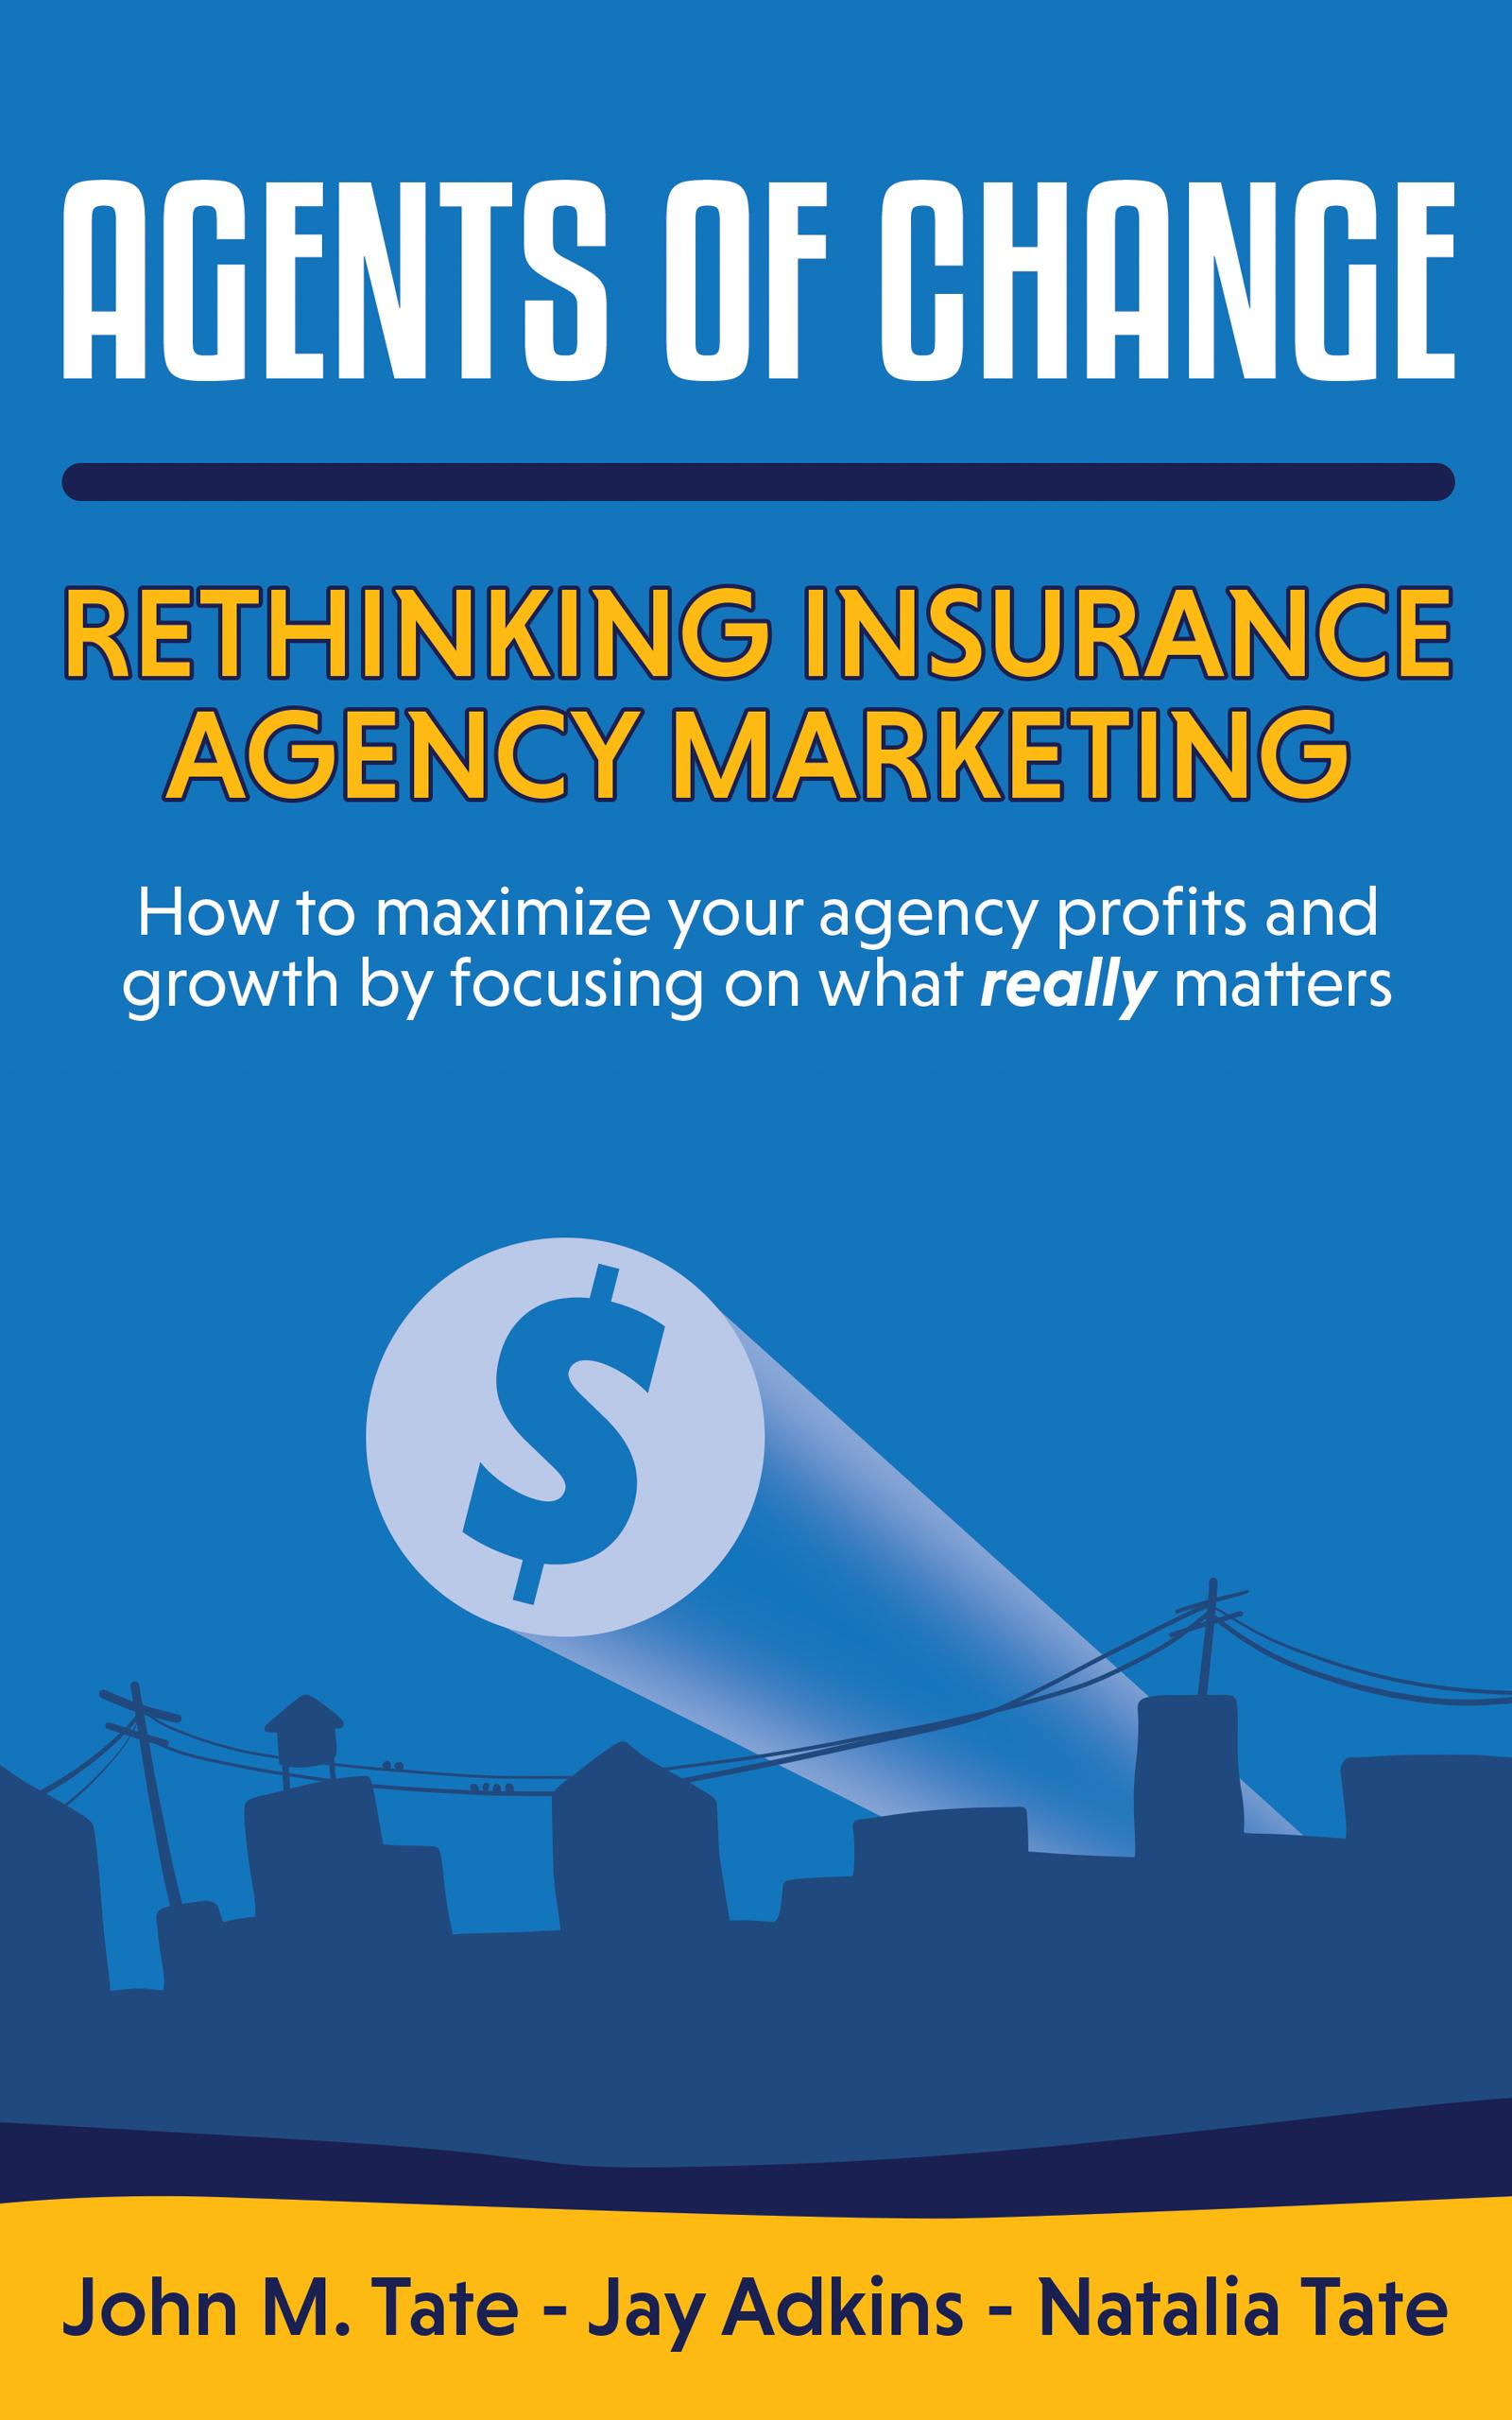 Rethinking Insurance Agency Marketing